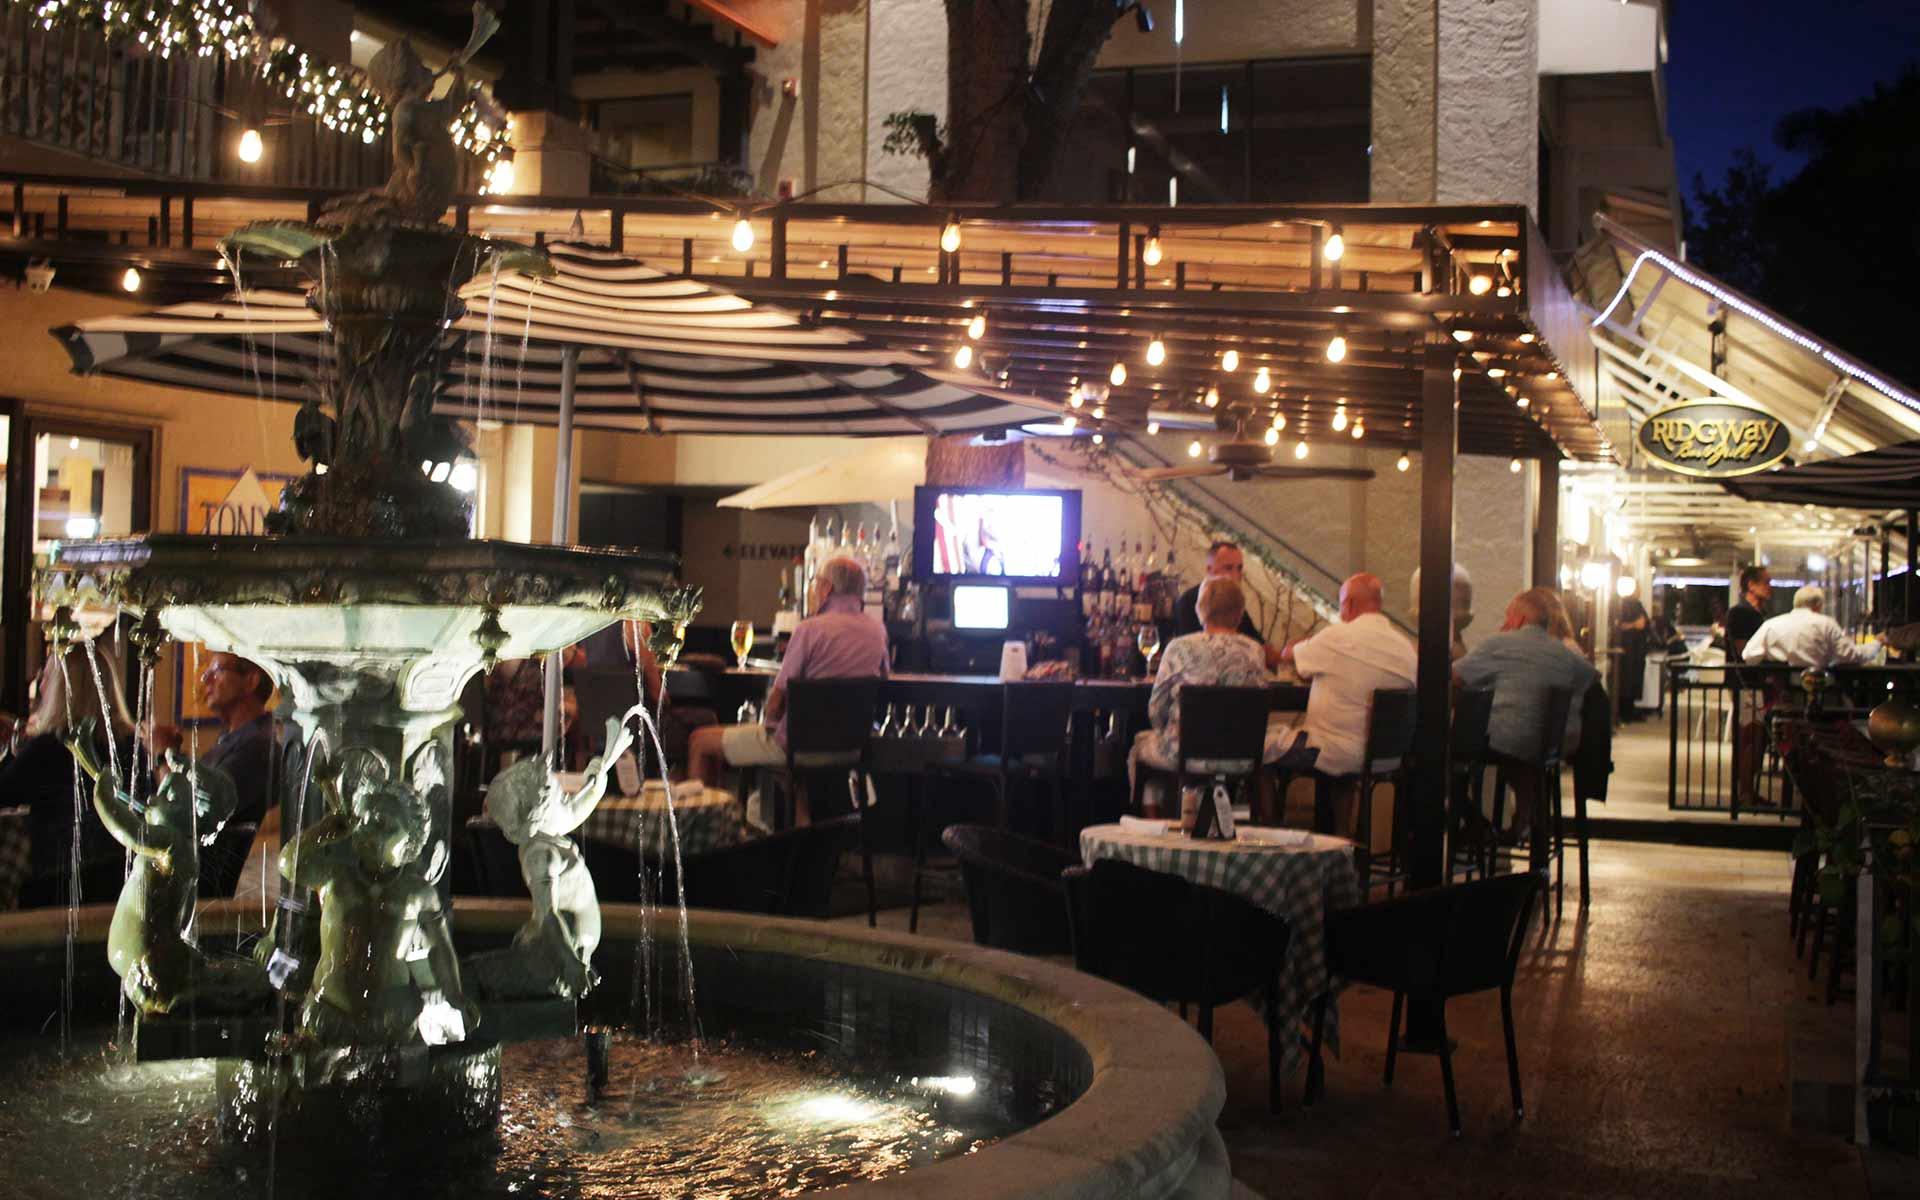 Courtyard at Ridgway Bar & Grill